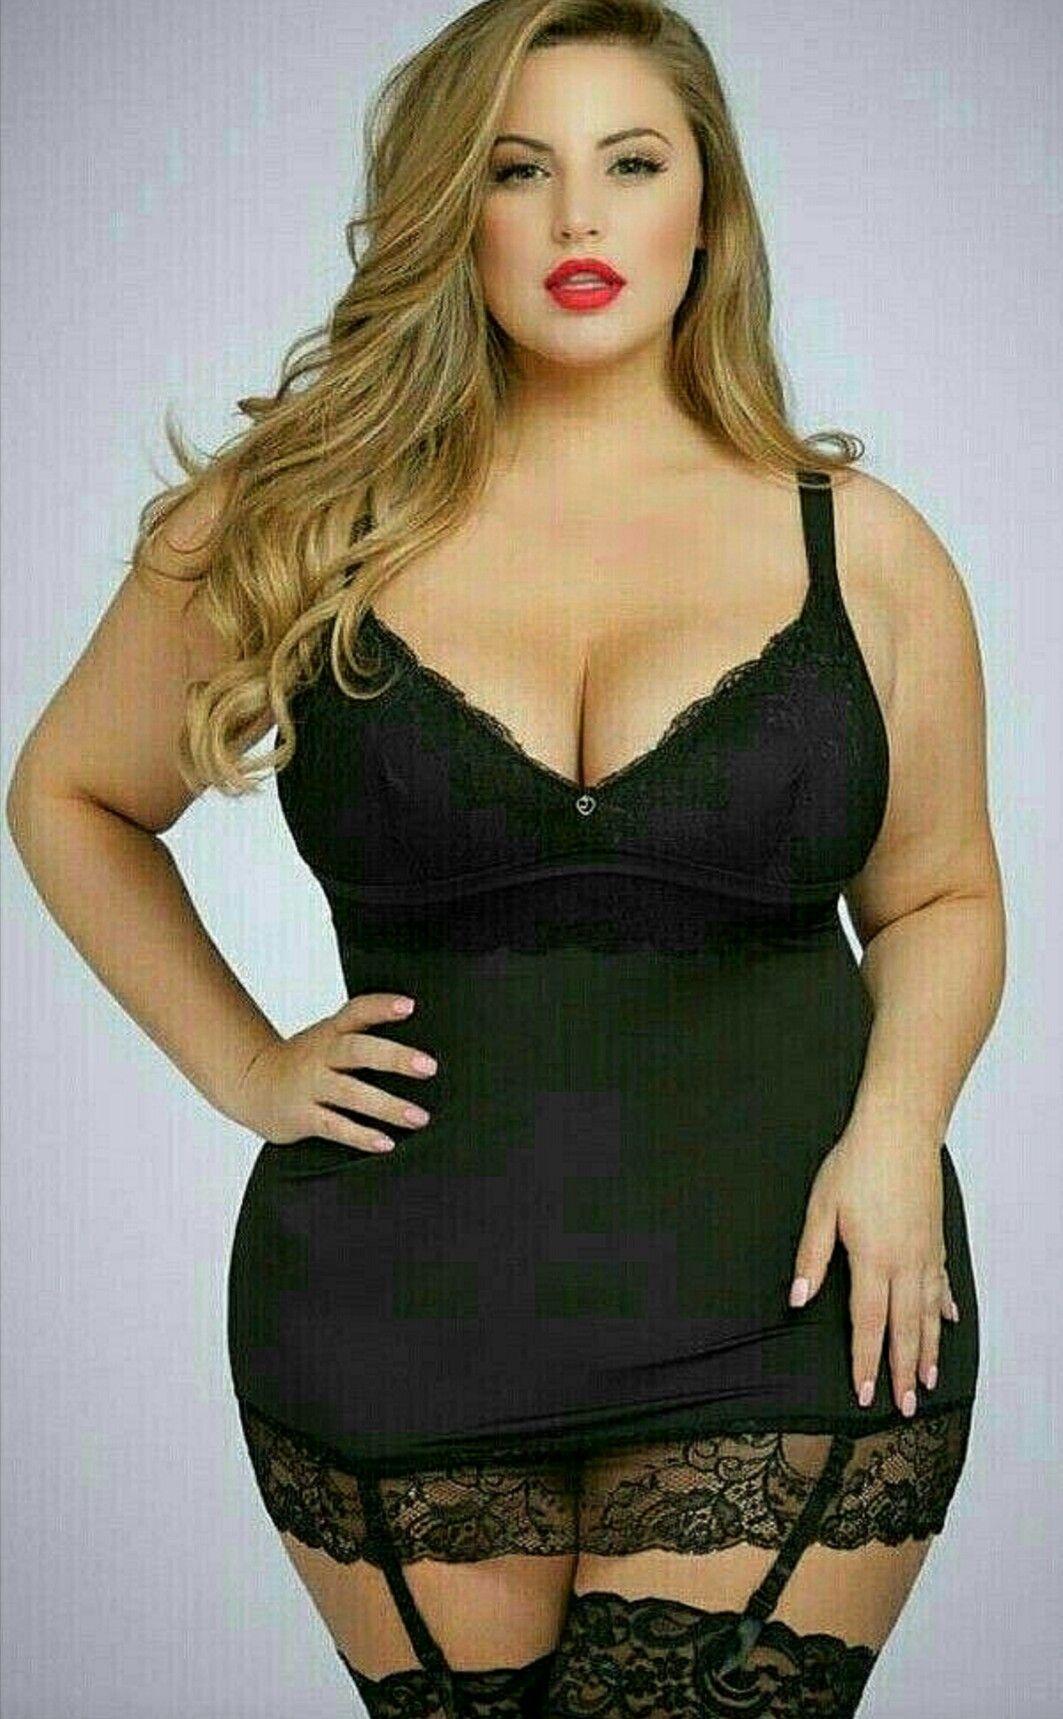 b0b35b935a572 Ashley Alexiss   Ropa   Ropa para gorditos, Modelo gordito och ...